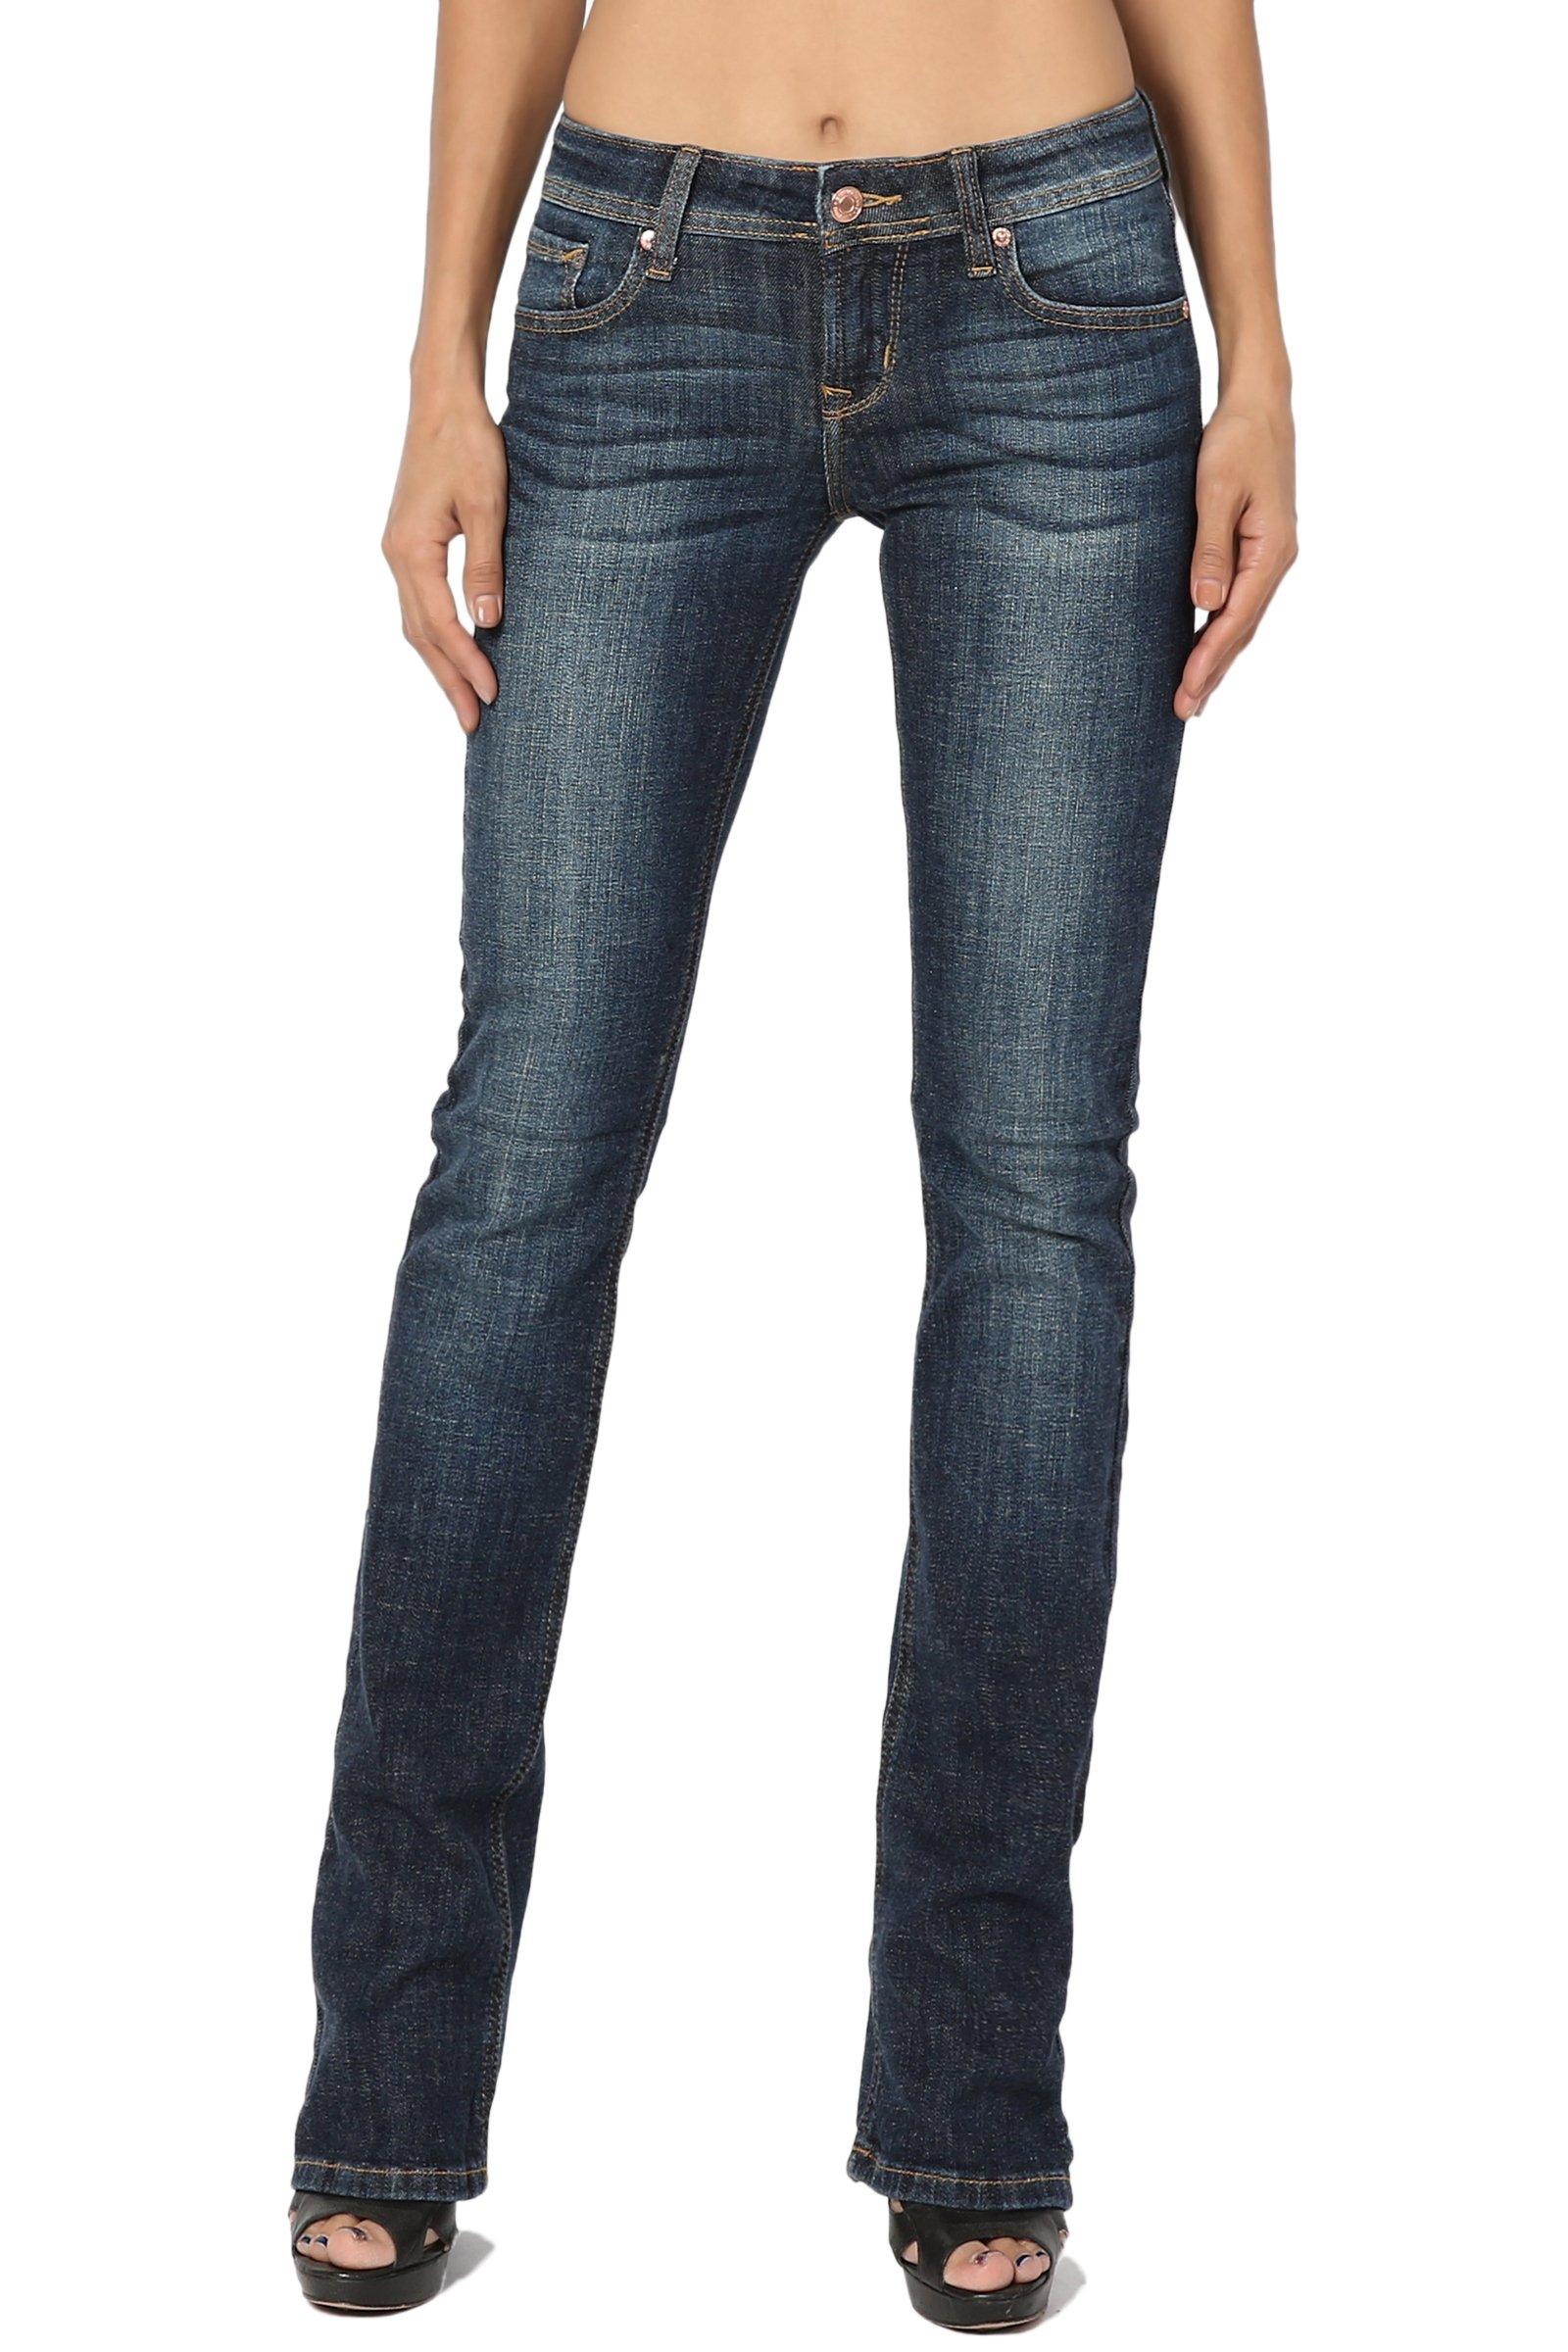 TheMogan Women's Mid Rise Slim Fit Bootcut Jeans in Soft Dark Blue Denim Dark 11